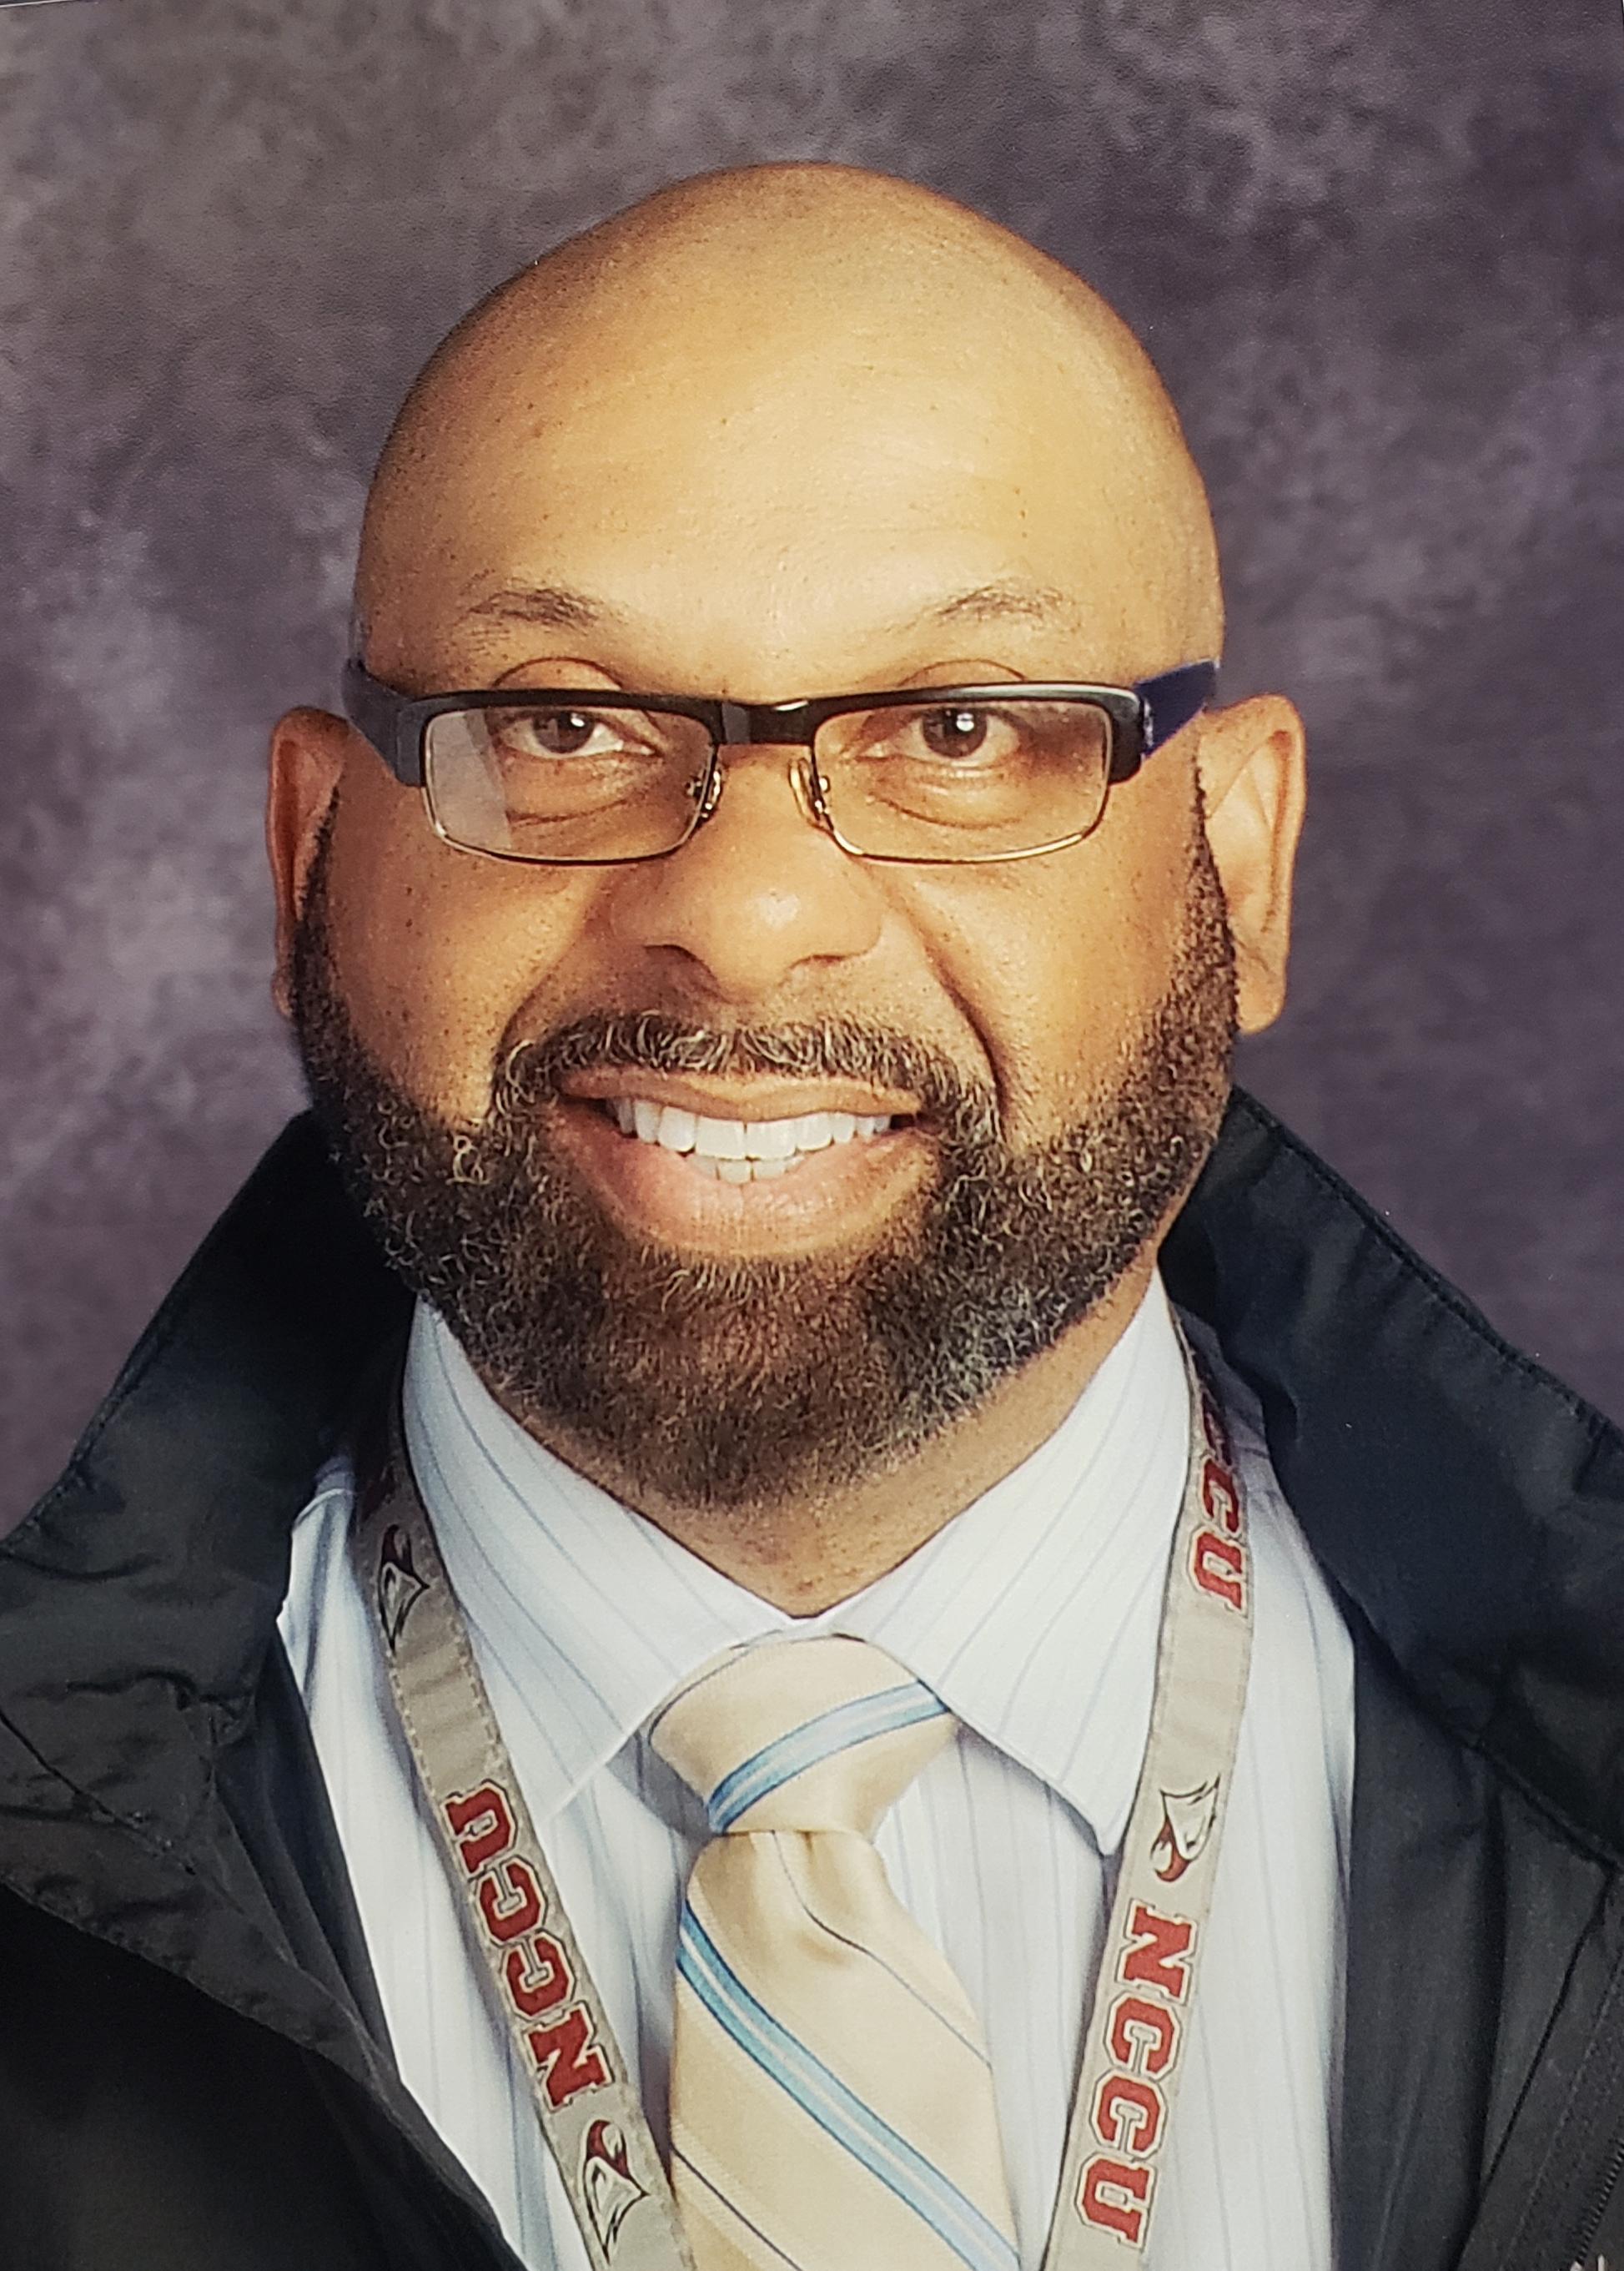 Mr. Bulluck, AP